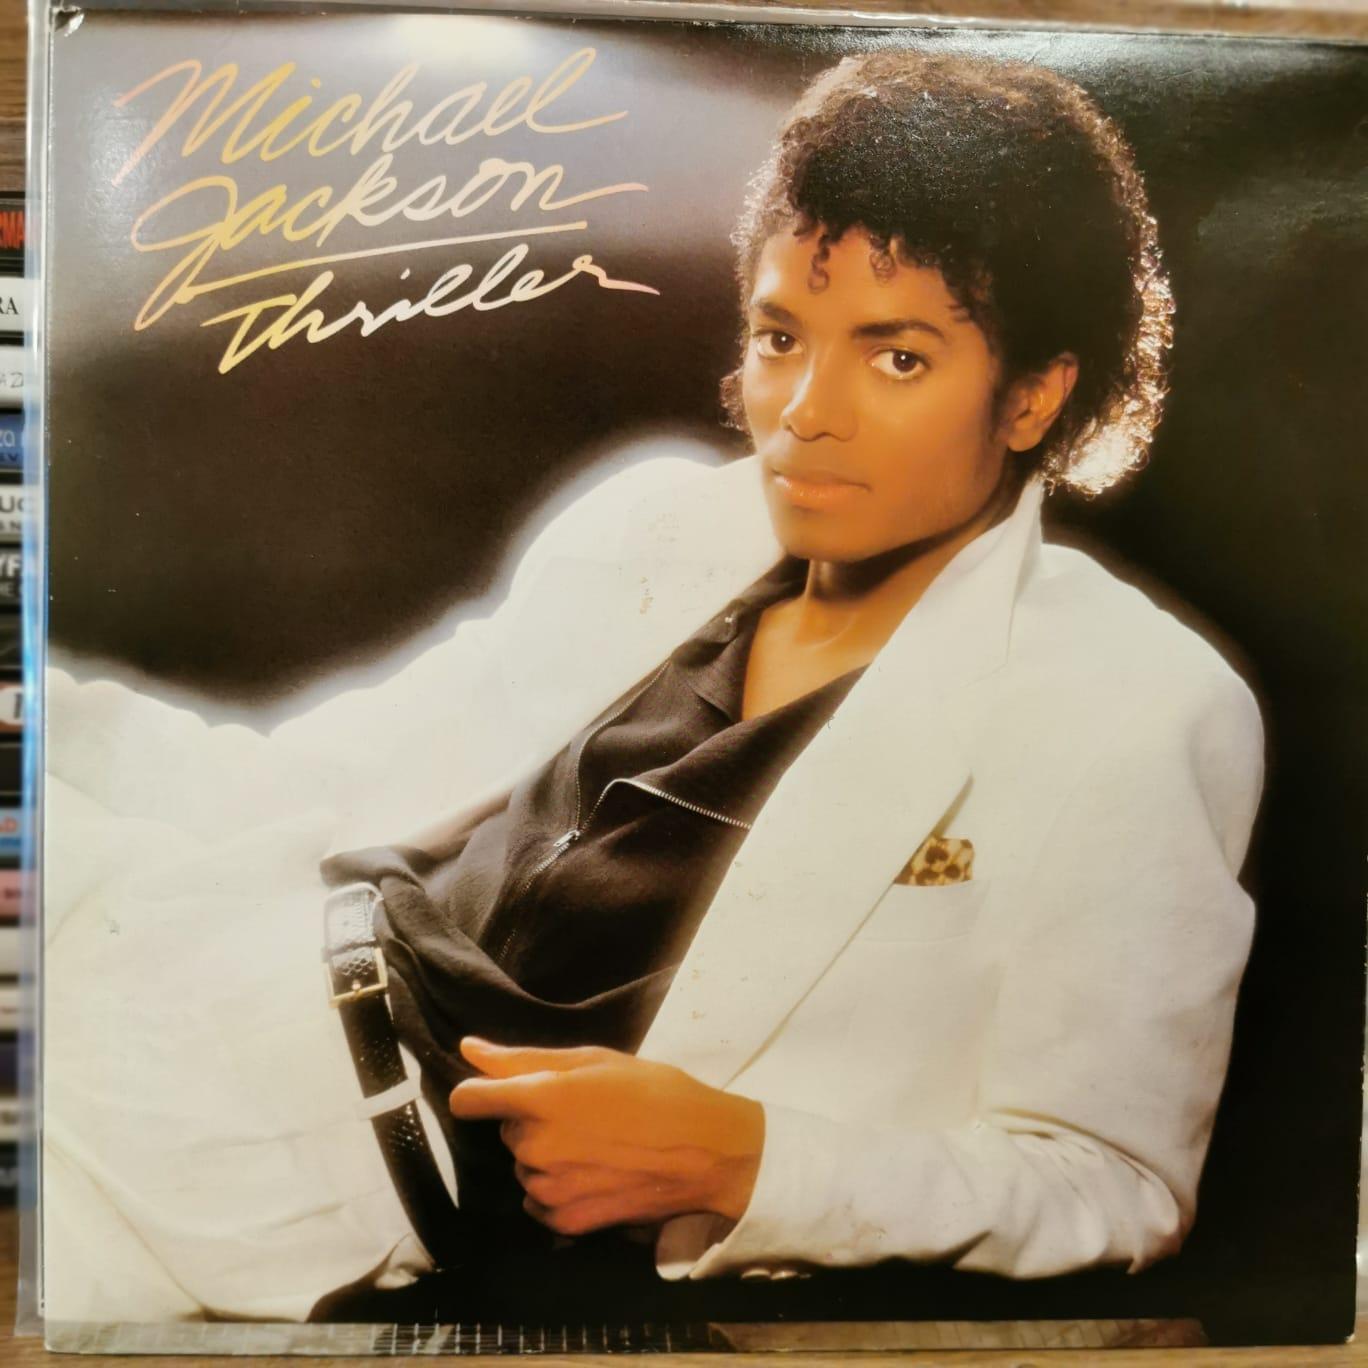 MICHAEL JACKSON – THRILLER - Vinyl, LP, Album, Stereo, Pitman Pressing, Gatefold